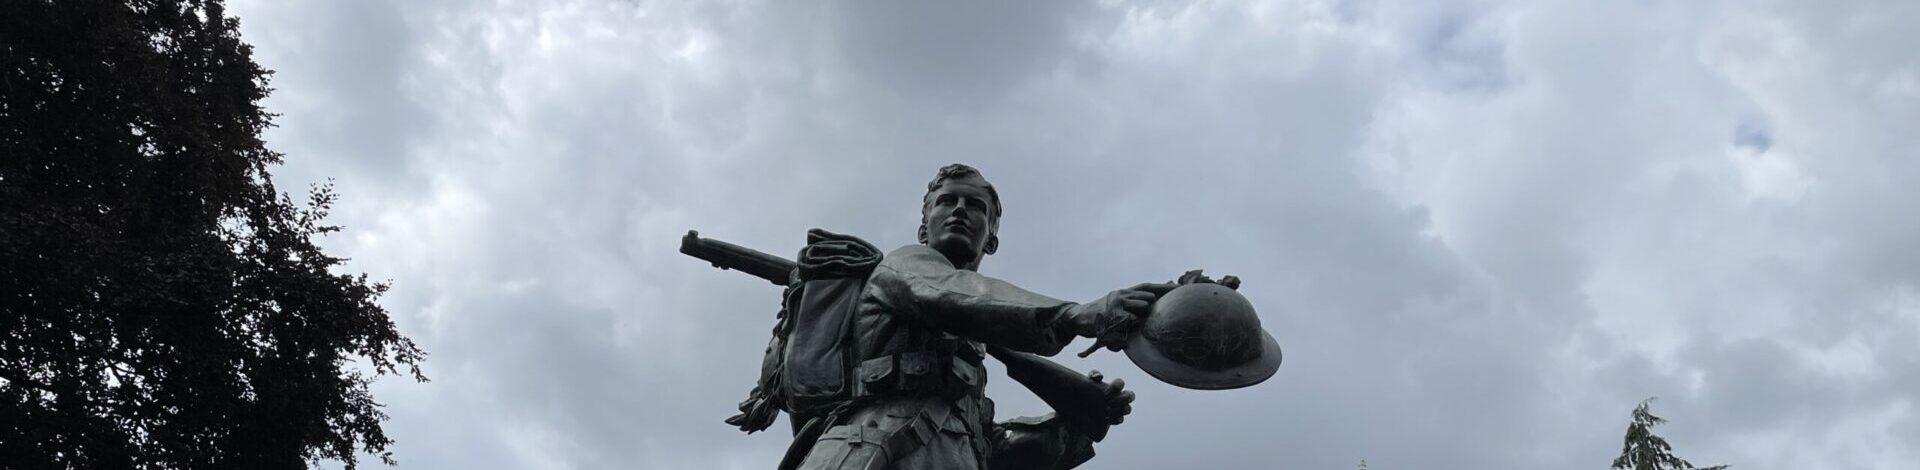 Cambridge Statues